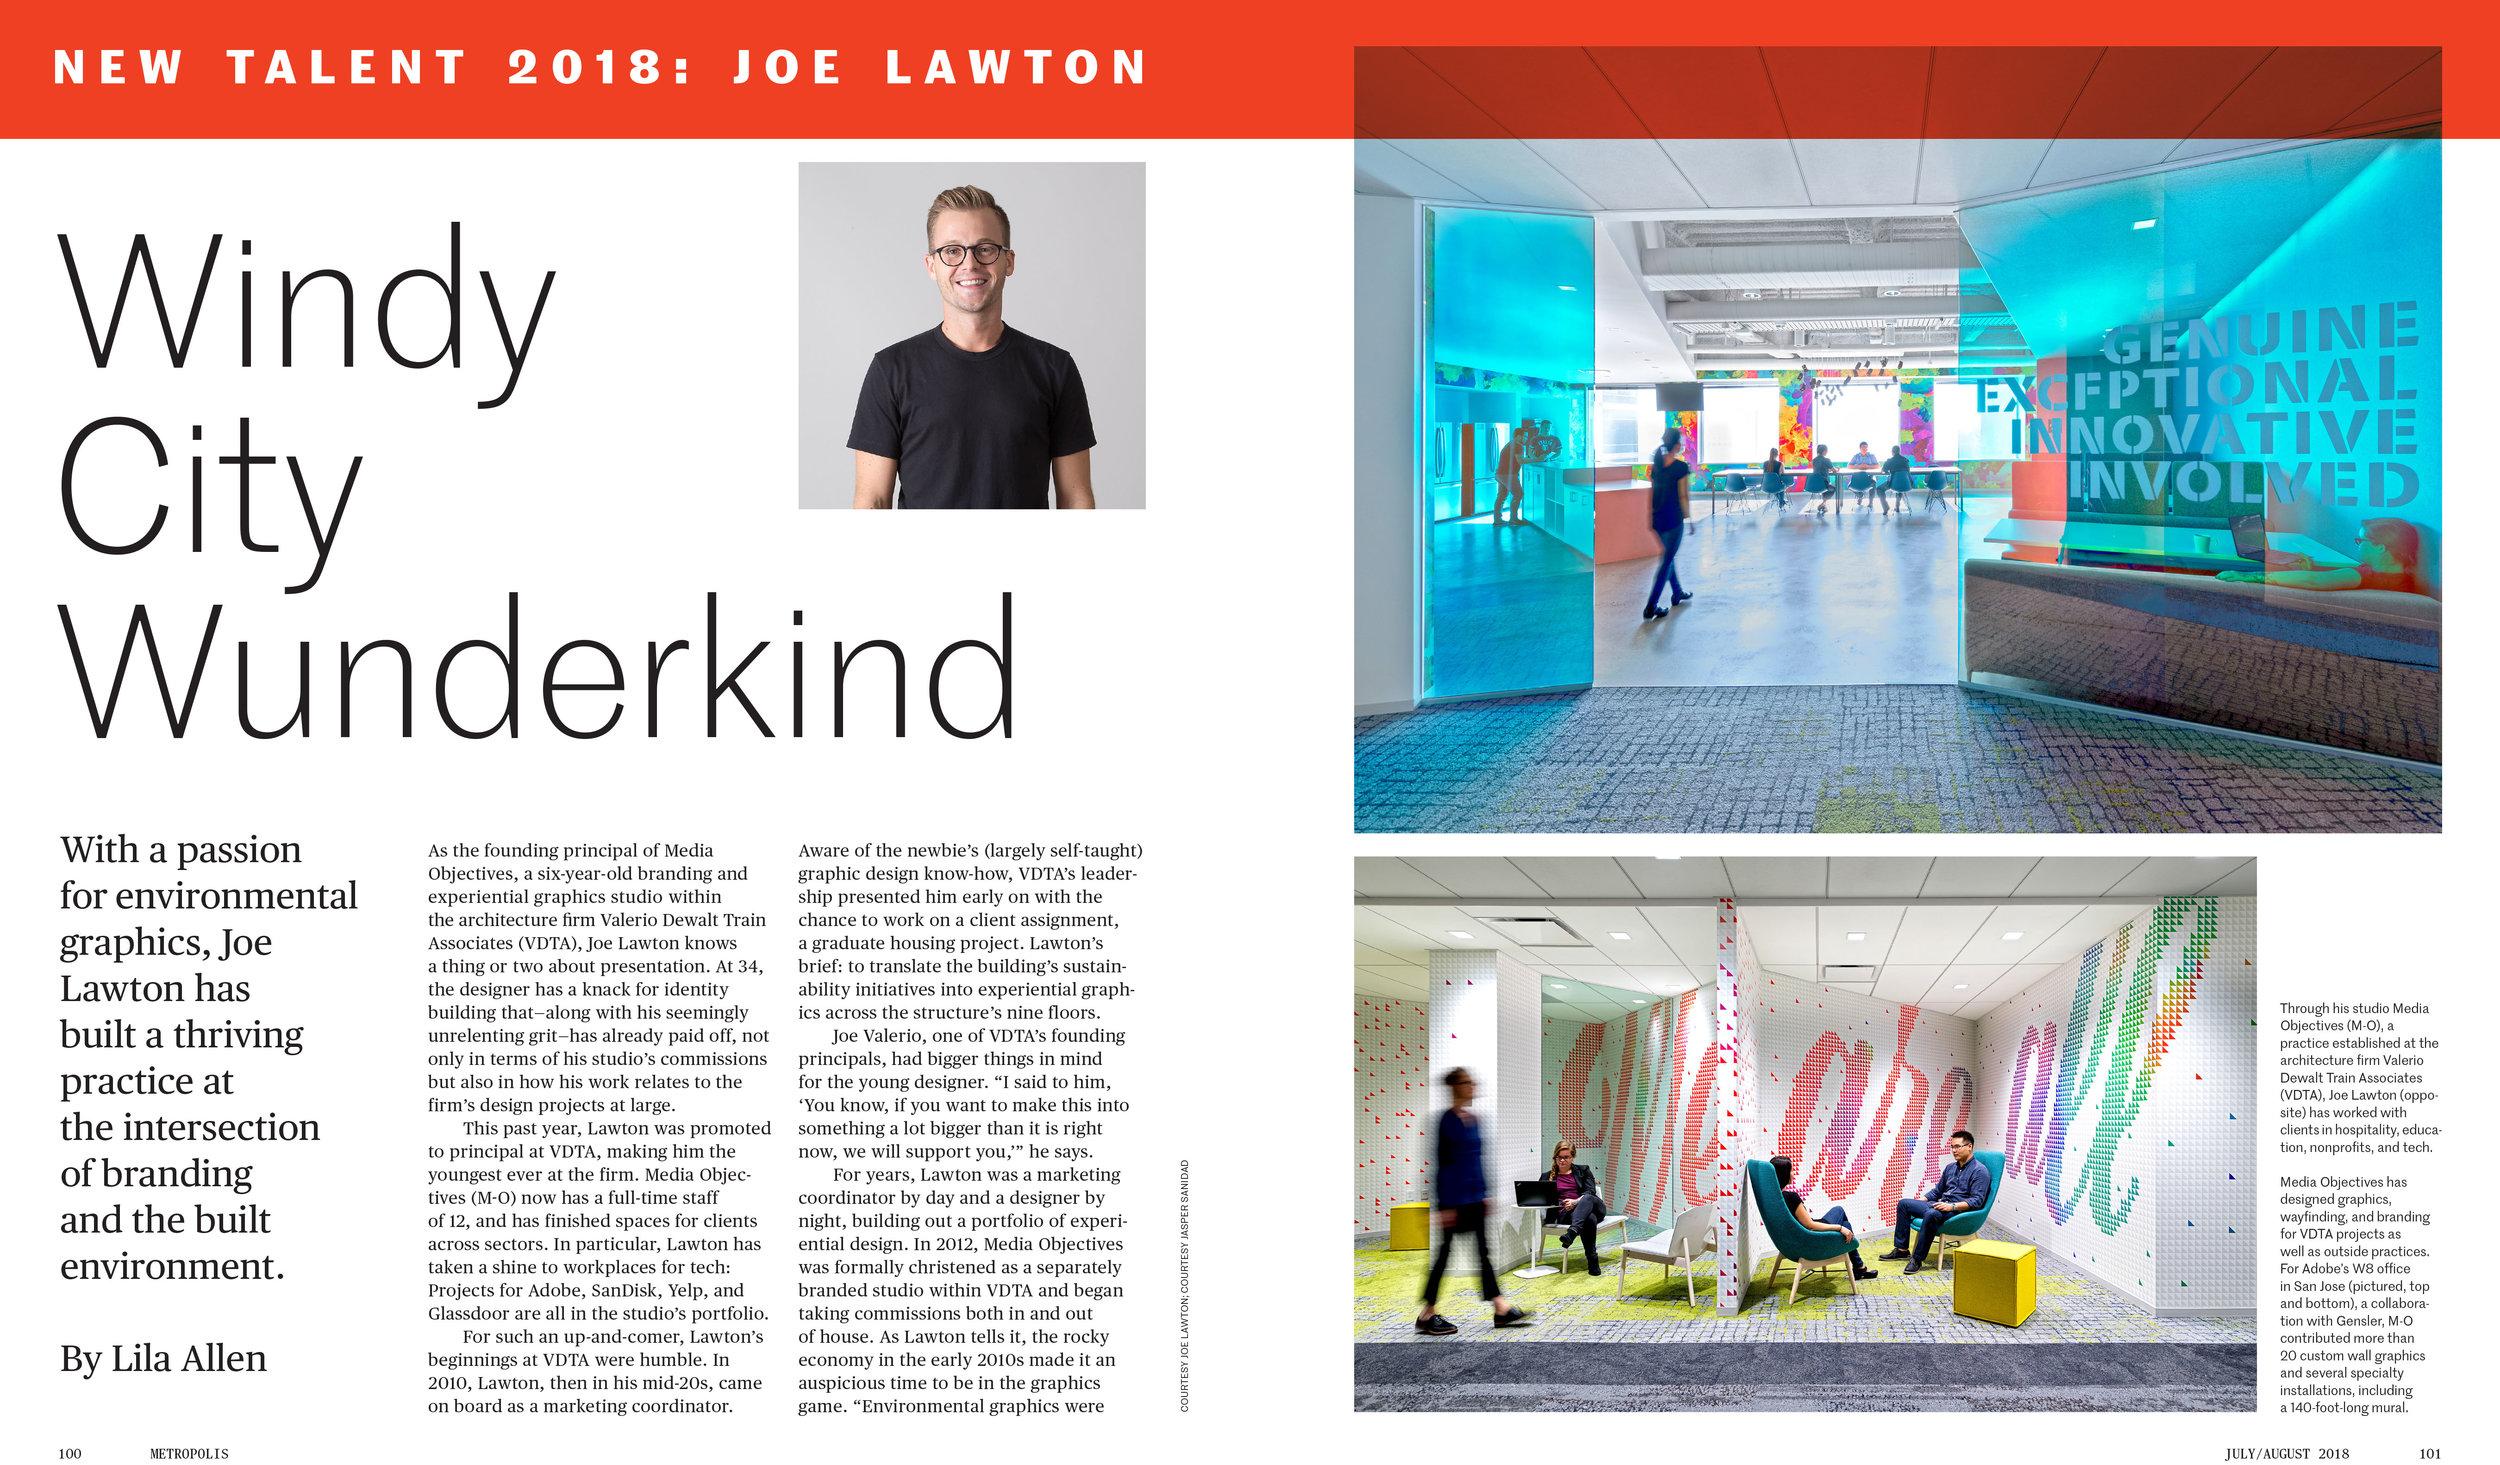 Joe Lawton and Media Objectives featured in Metropolis Magazine